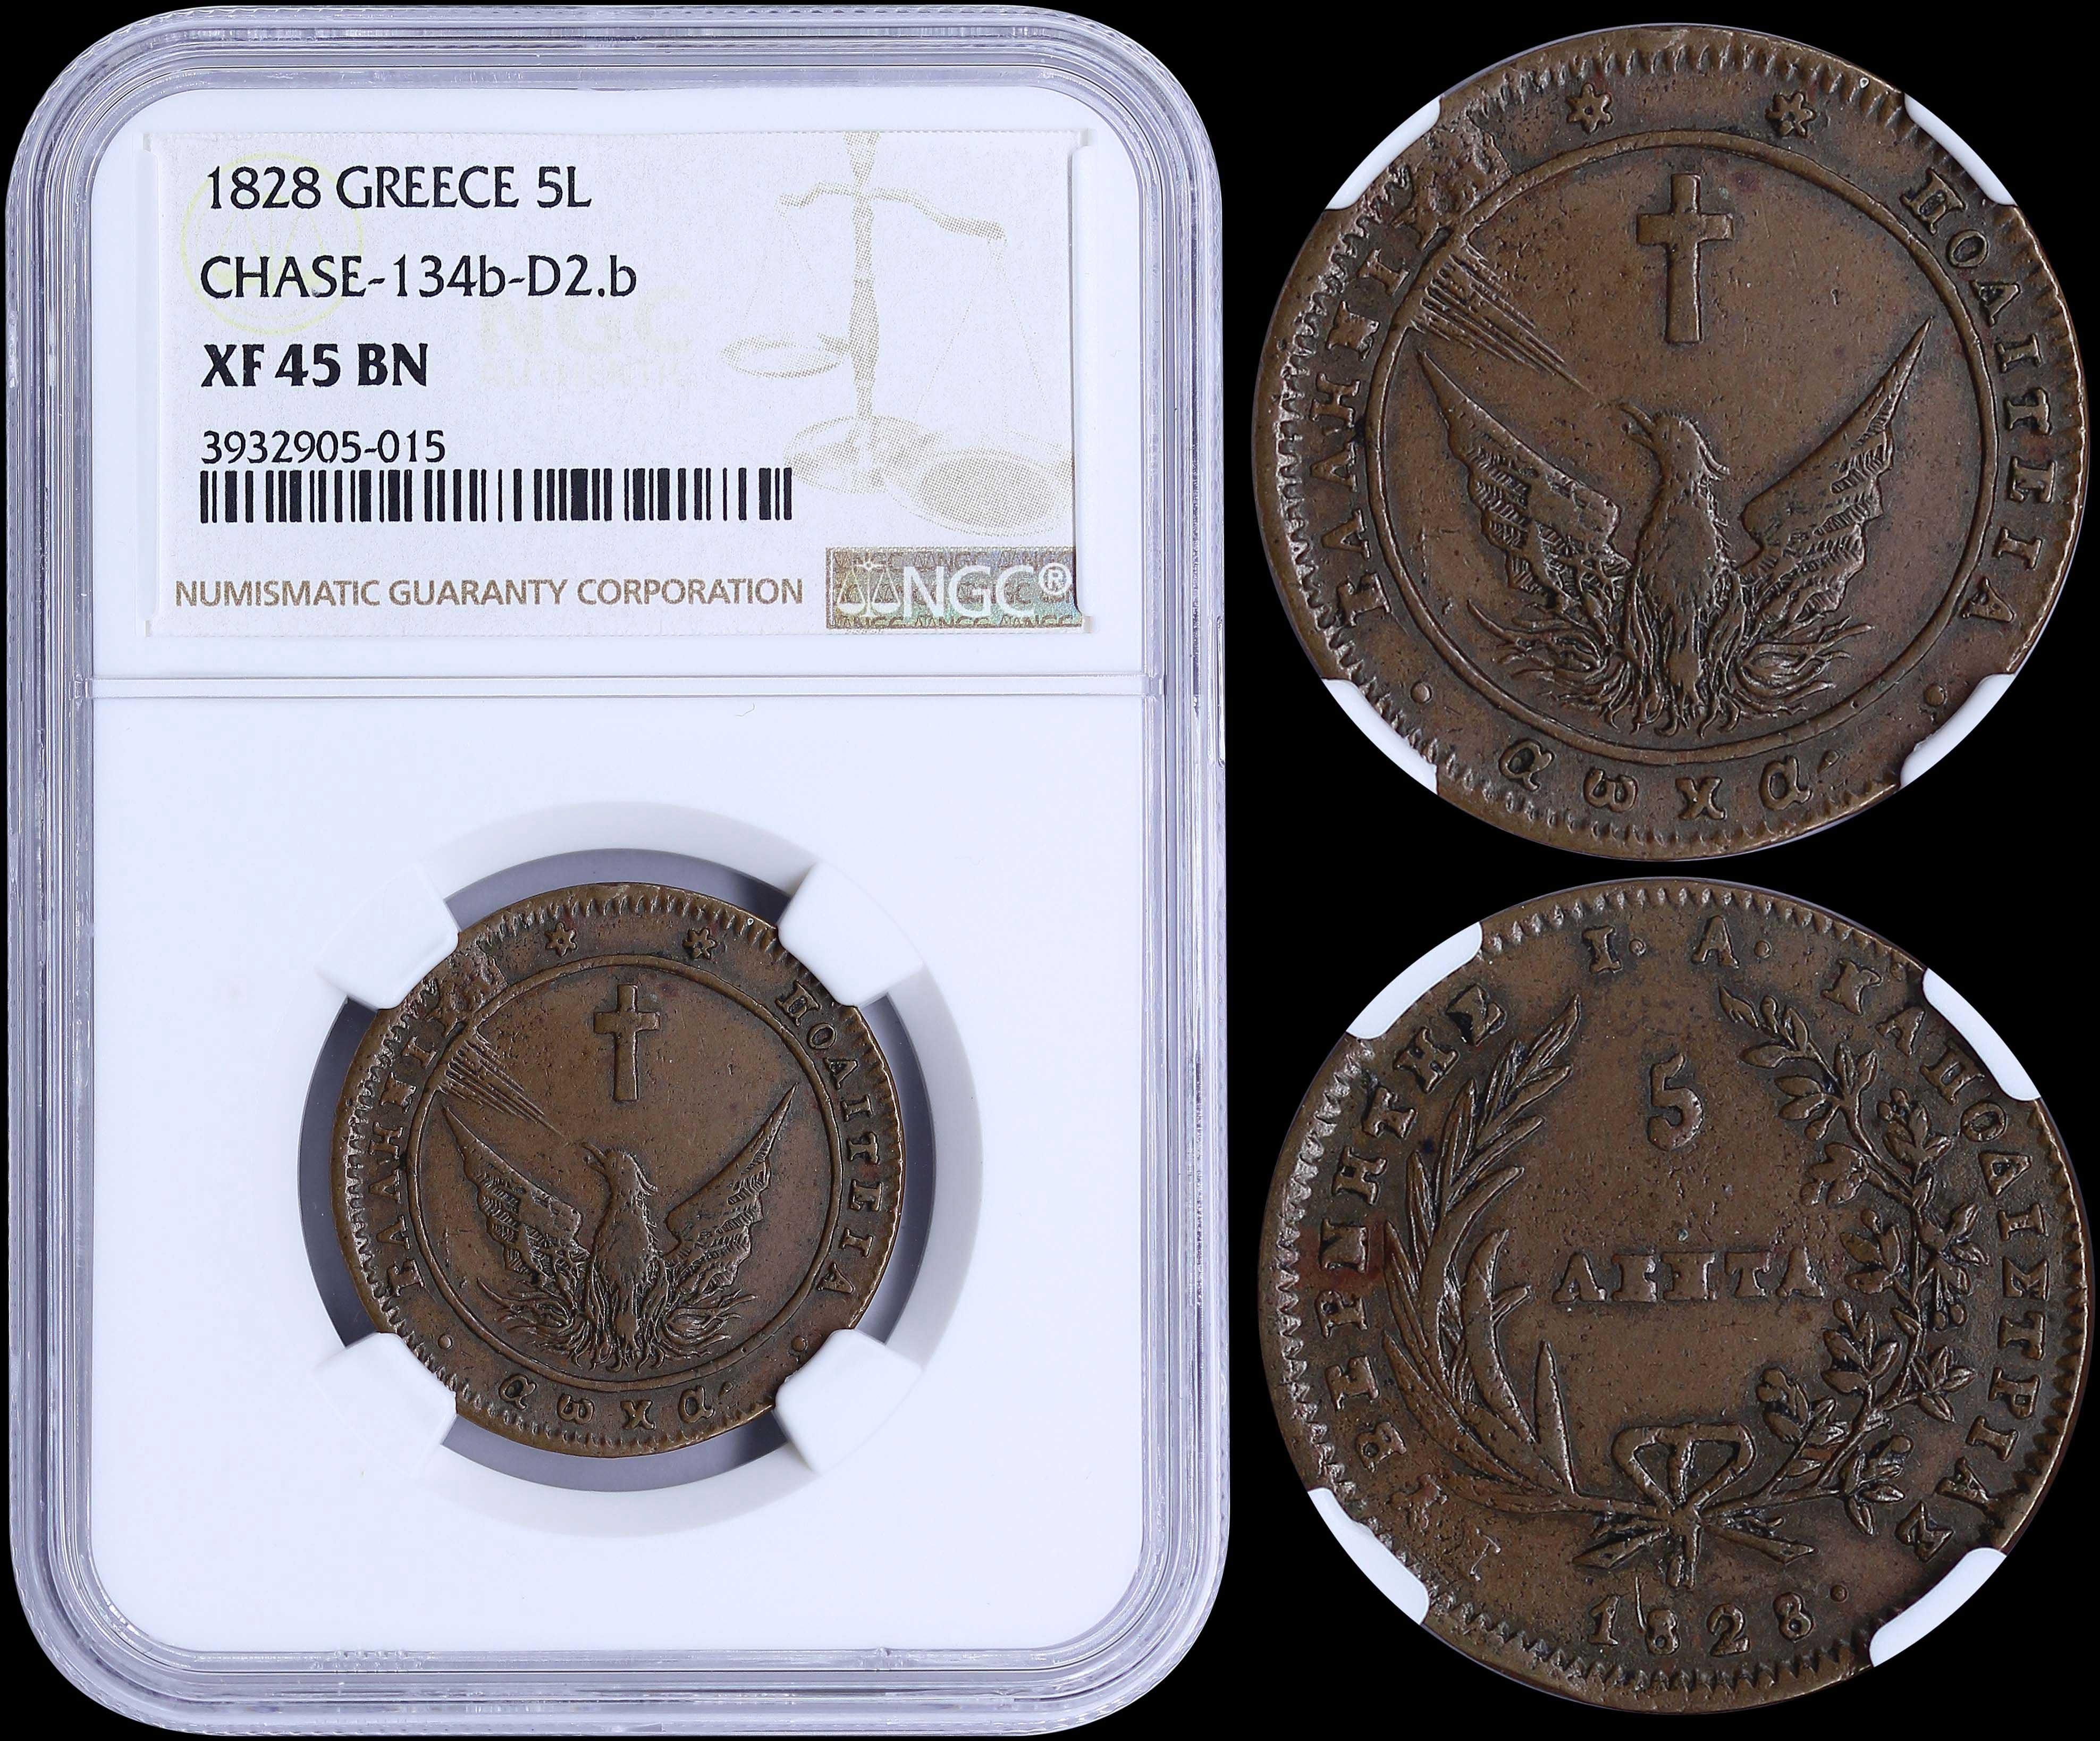 Lot 8012 - -  COINS & TOKENS governor capodistrias -  A. Karamitsos Public & Live Bid Auction 649 Coins, Medals & Banknotes